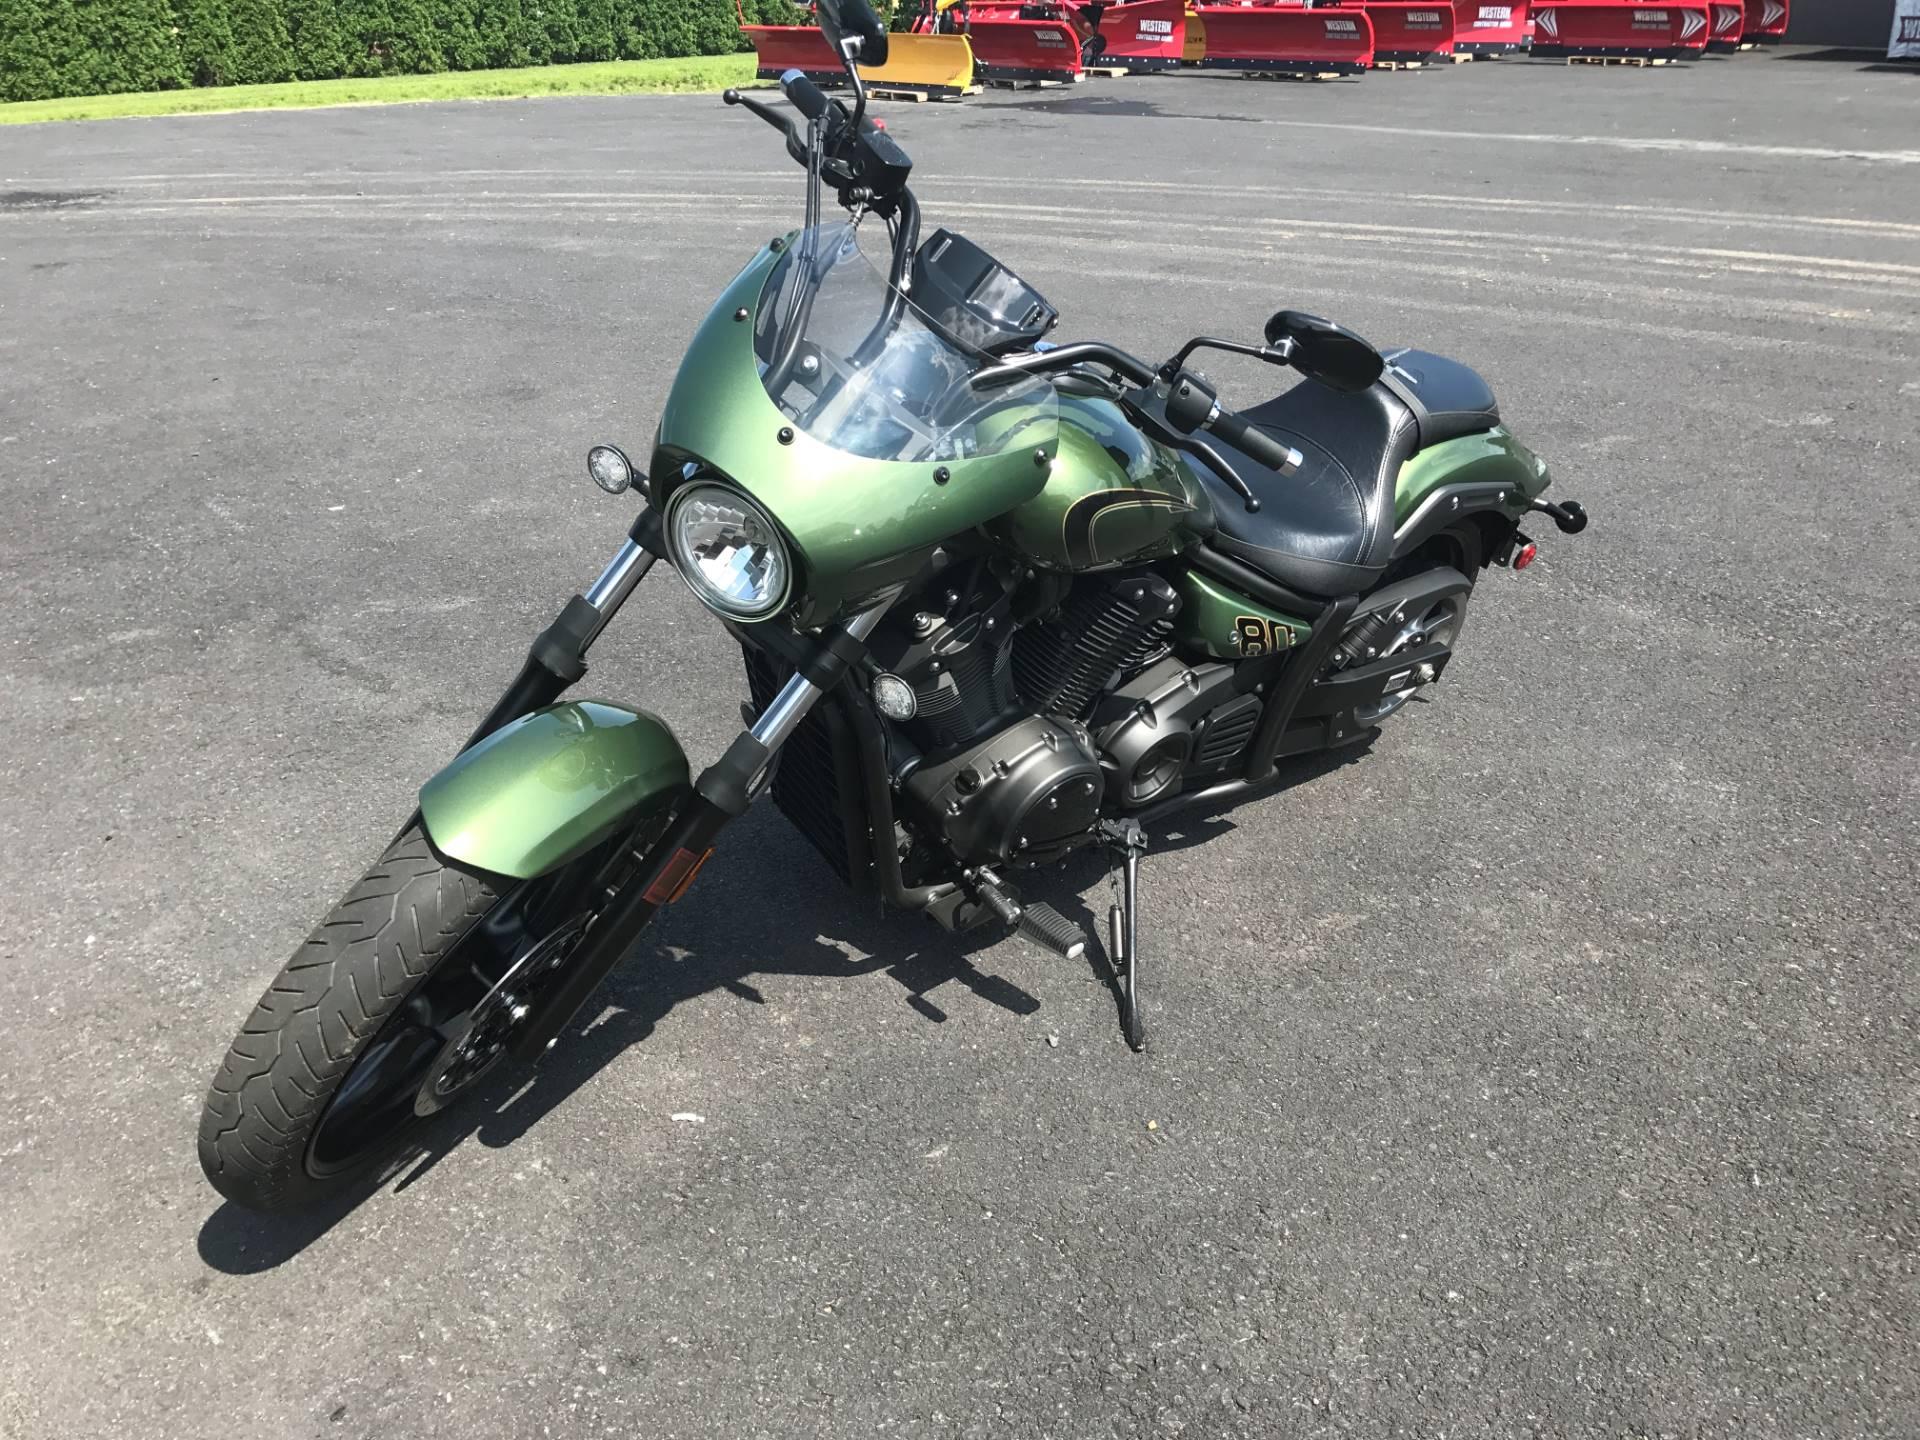 2015 Yamaha Stryker Bullet Cowl for sale 51304